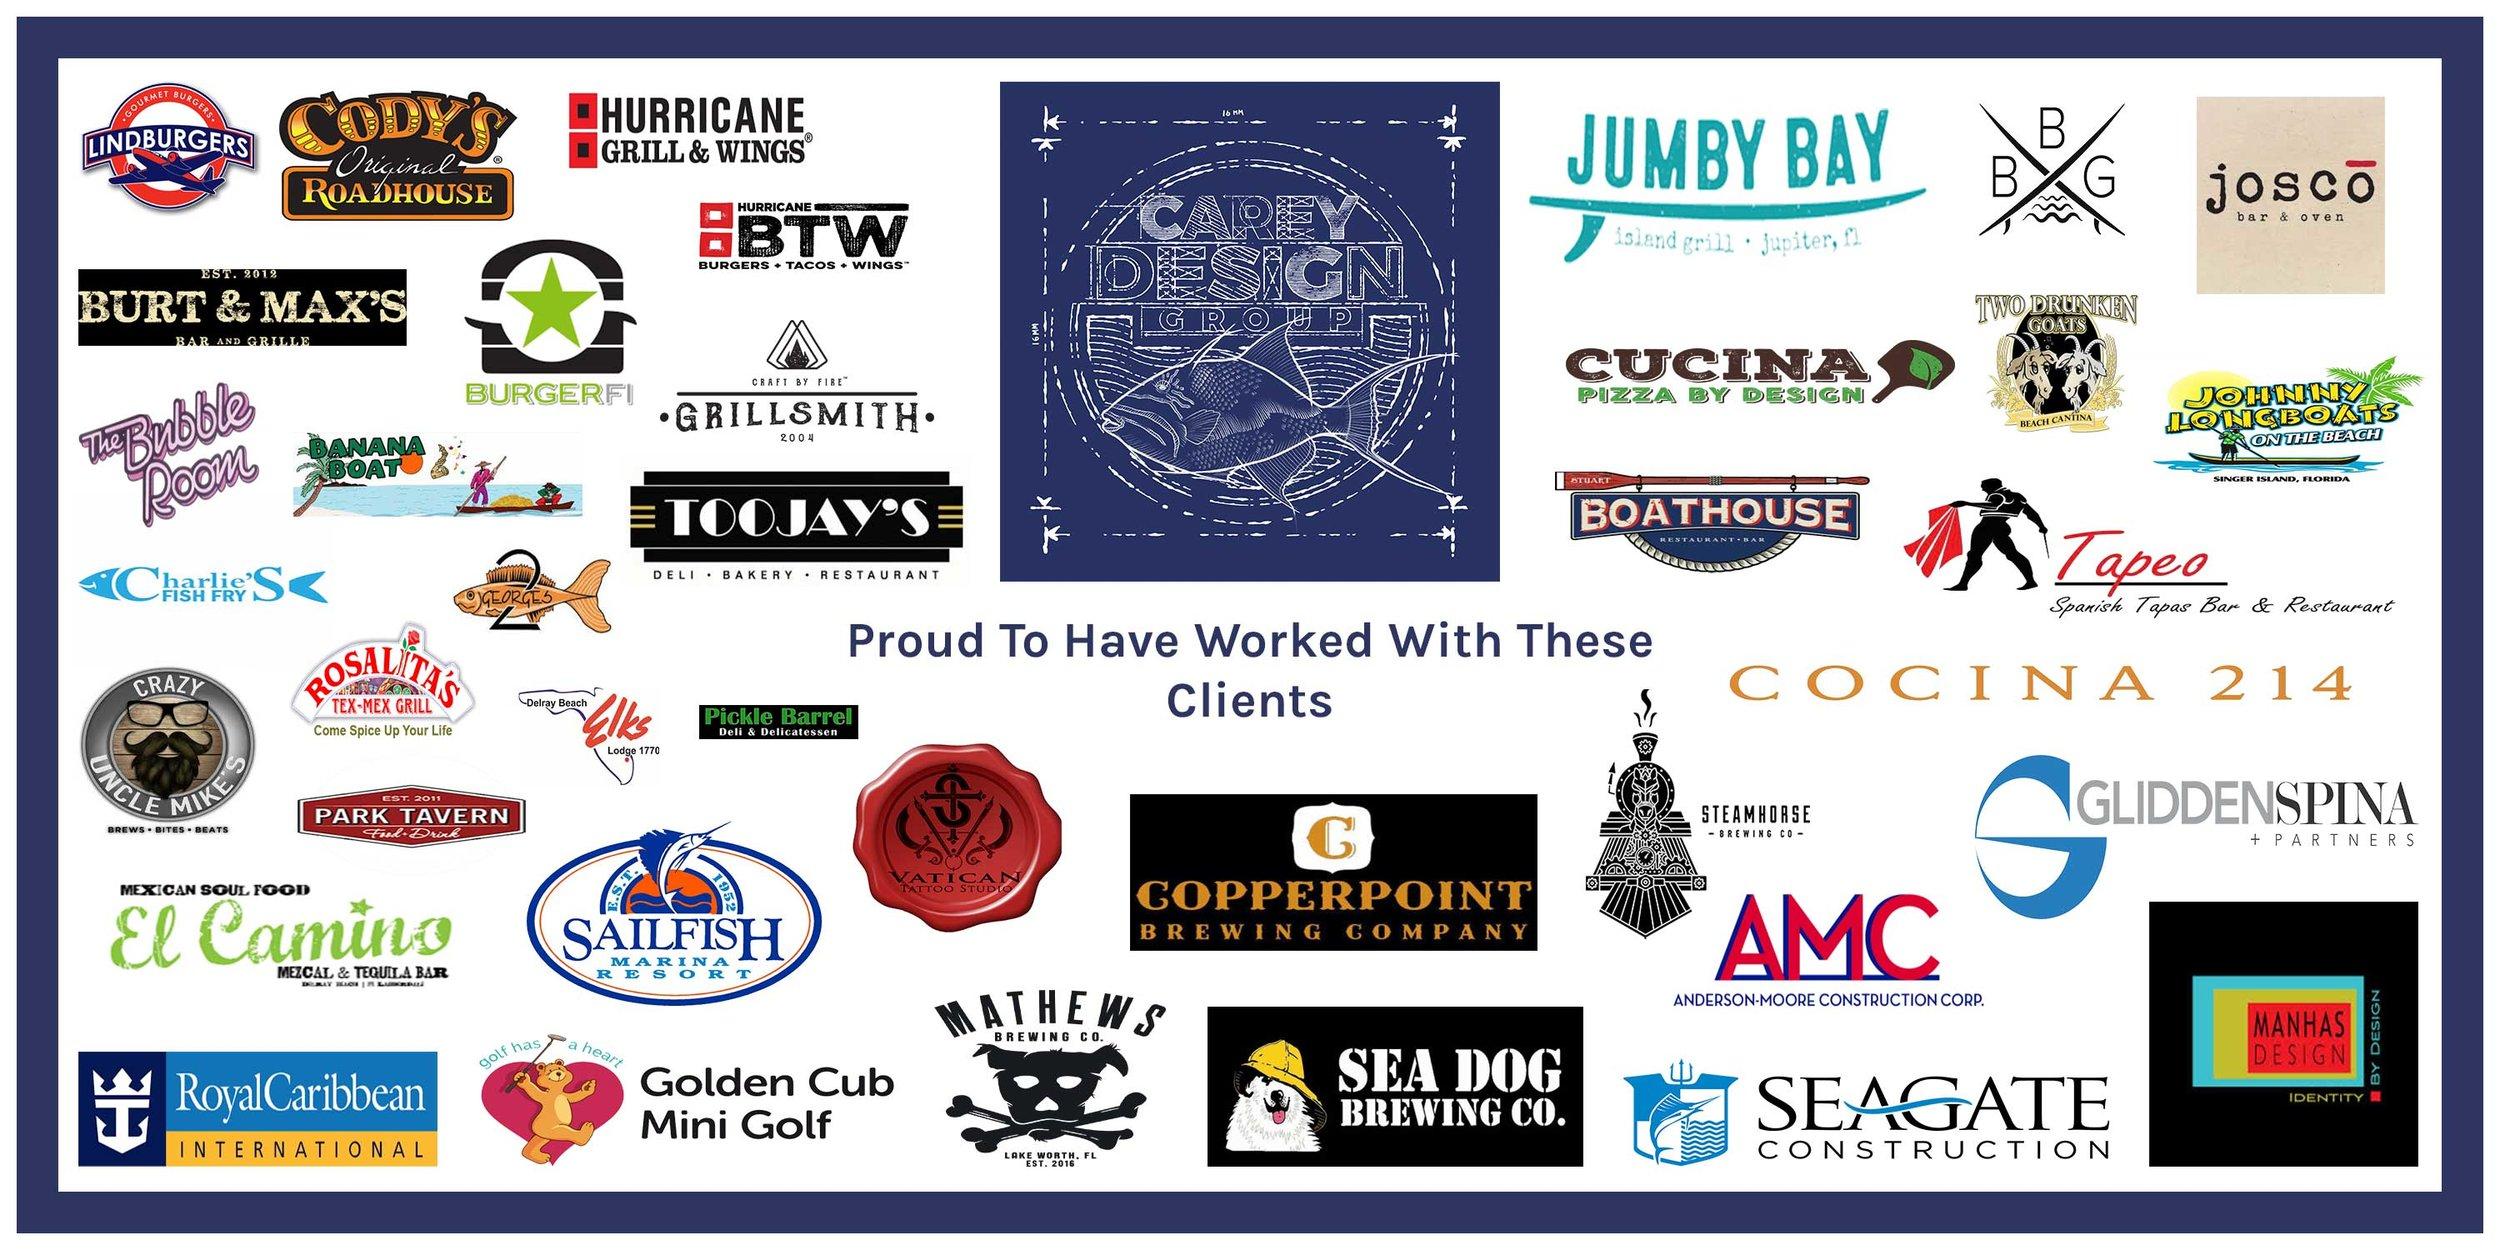 Carey_Design_Group_Clients_Logos